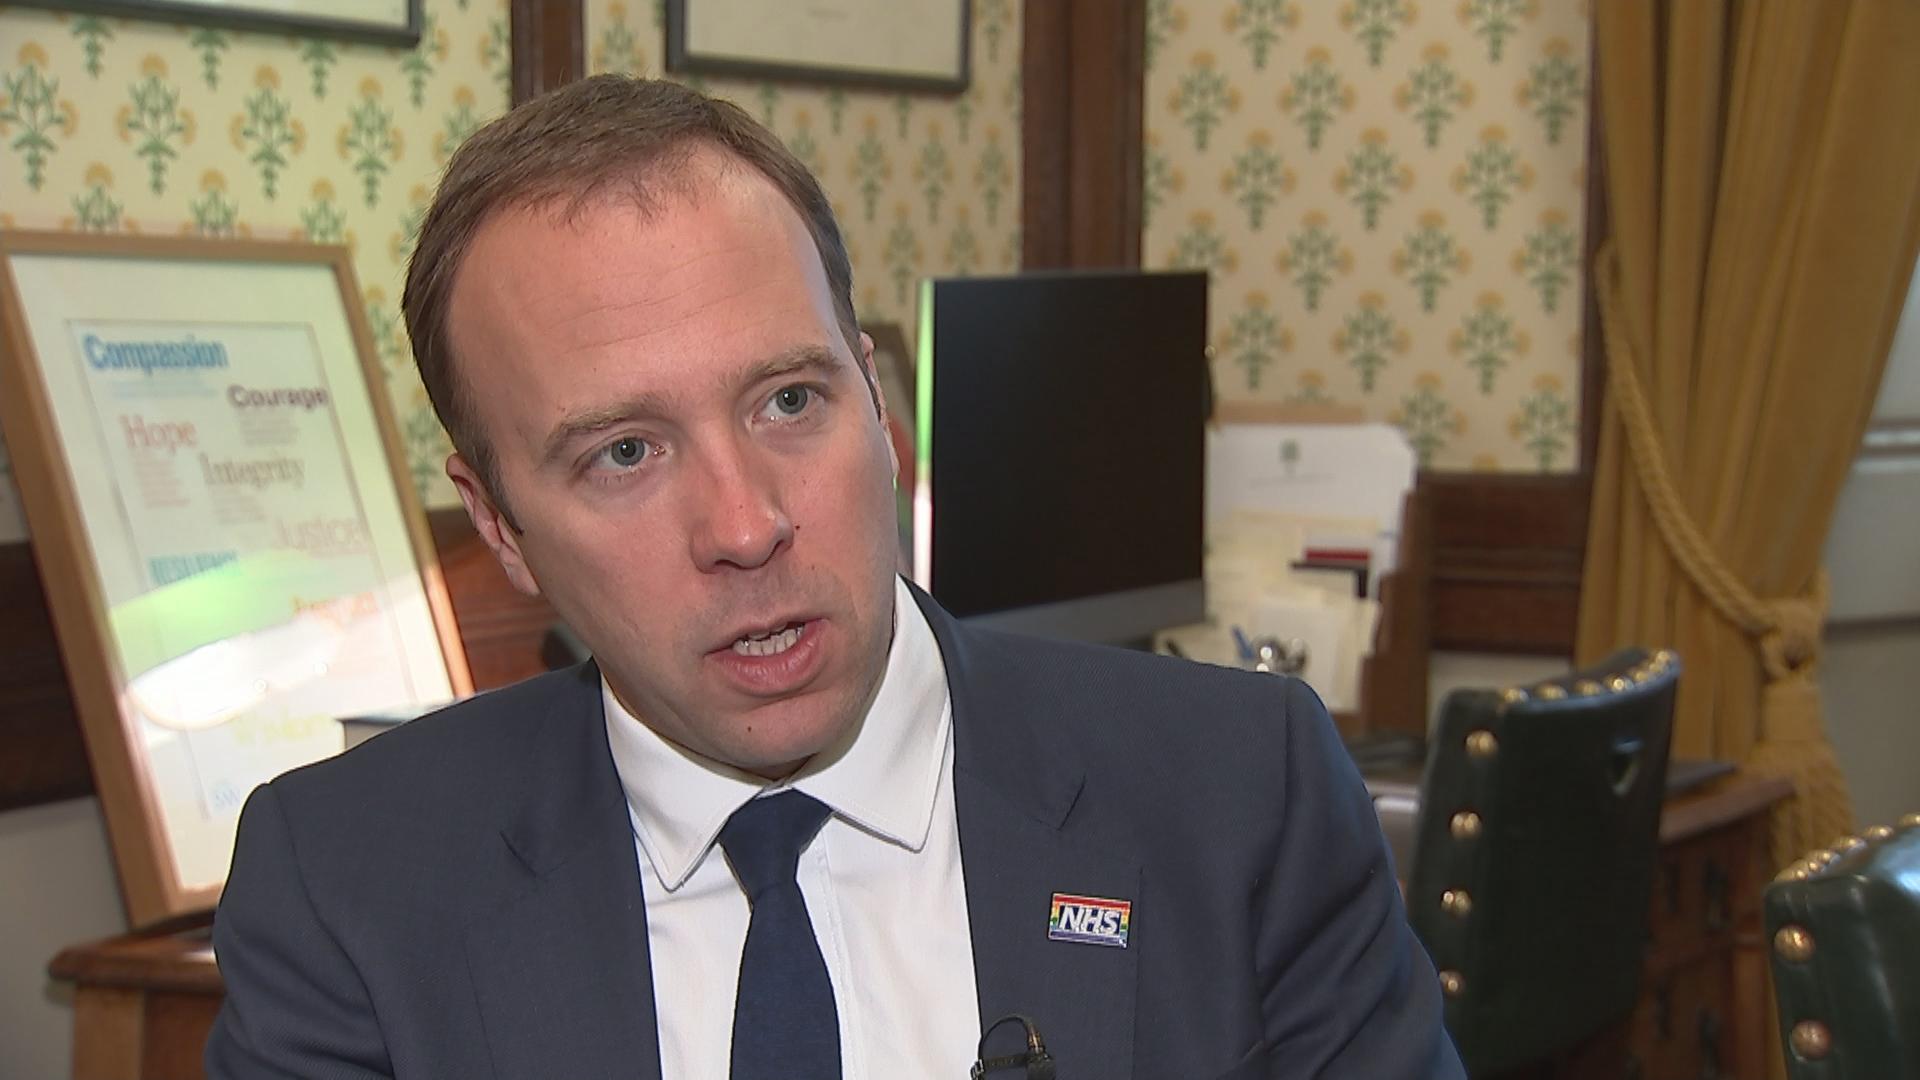 Matt Hancock Backs Boris Johnson In Leadership Race